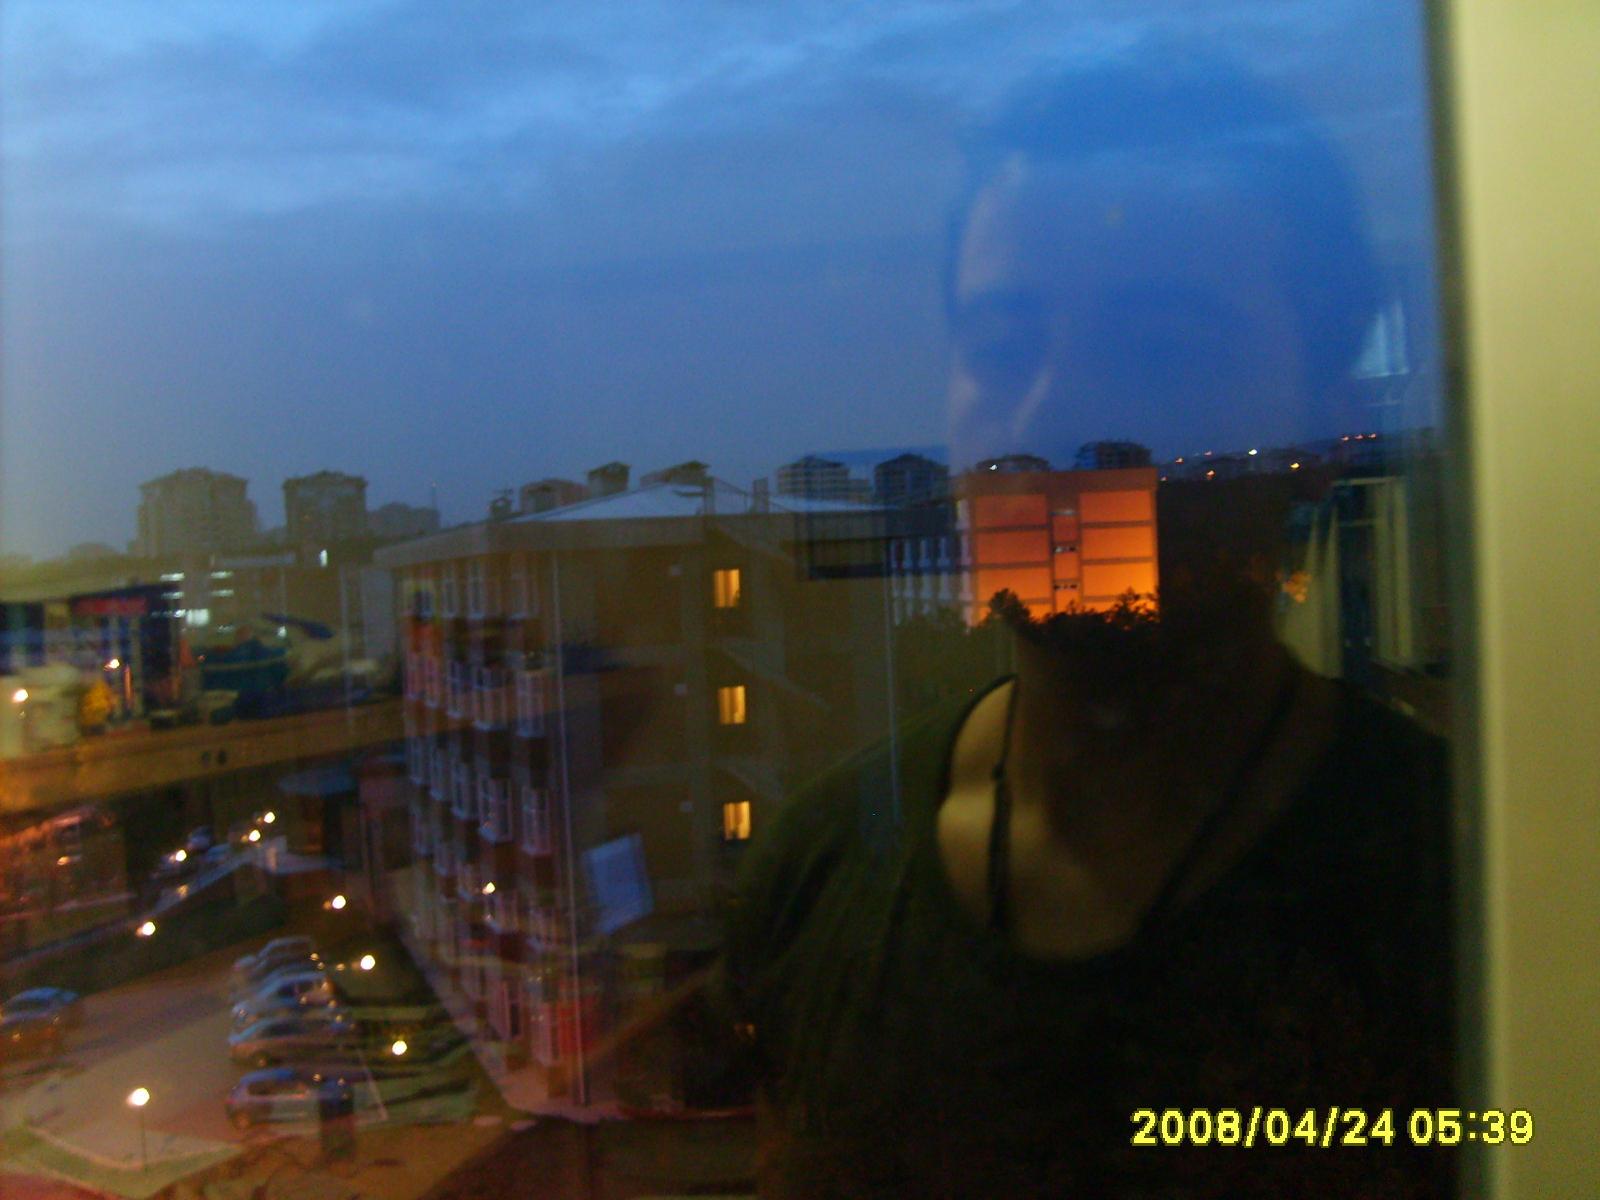 Towards the dawn by AlfAu